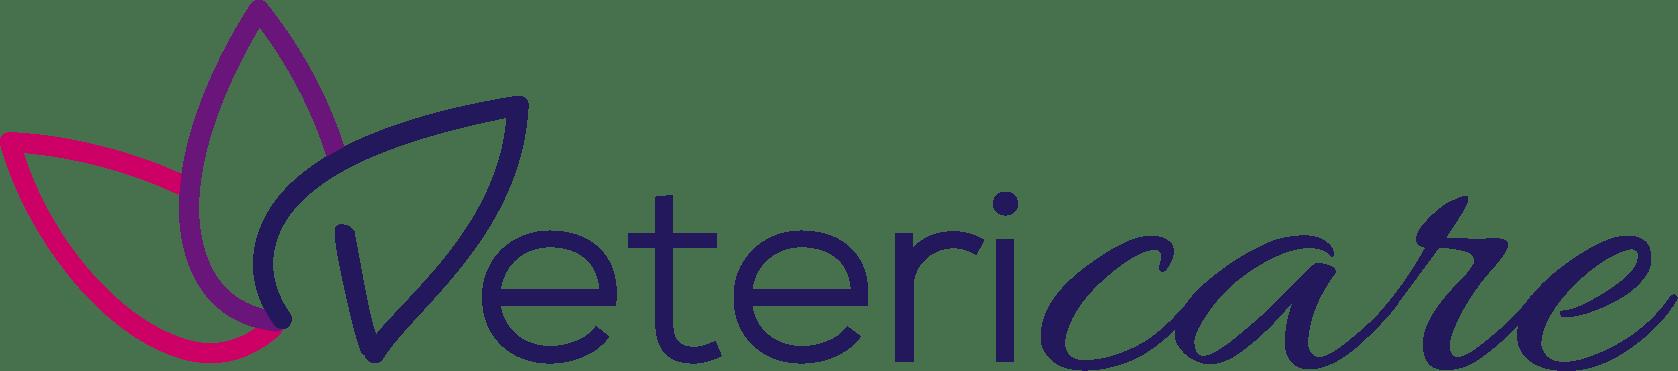 logo vetericare couleurs